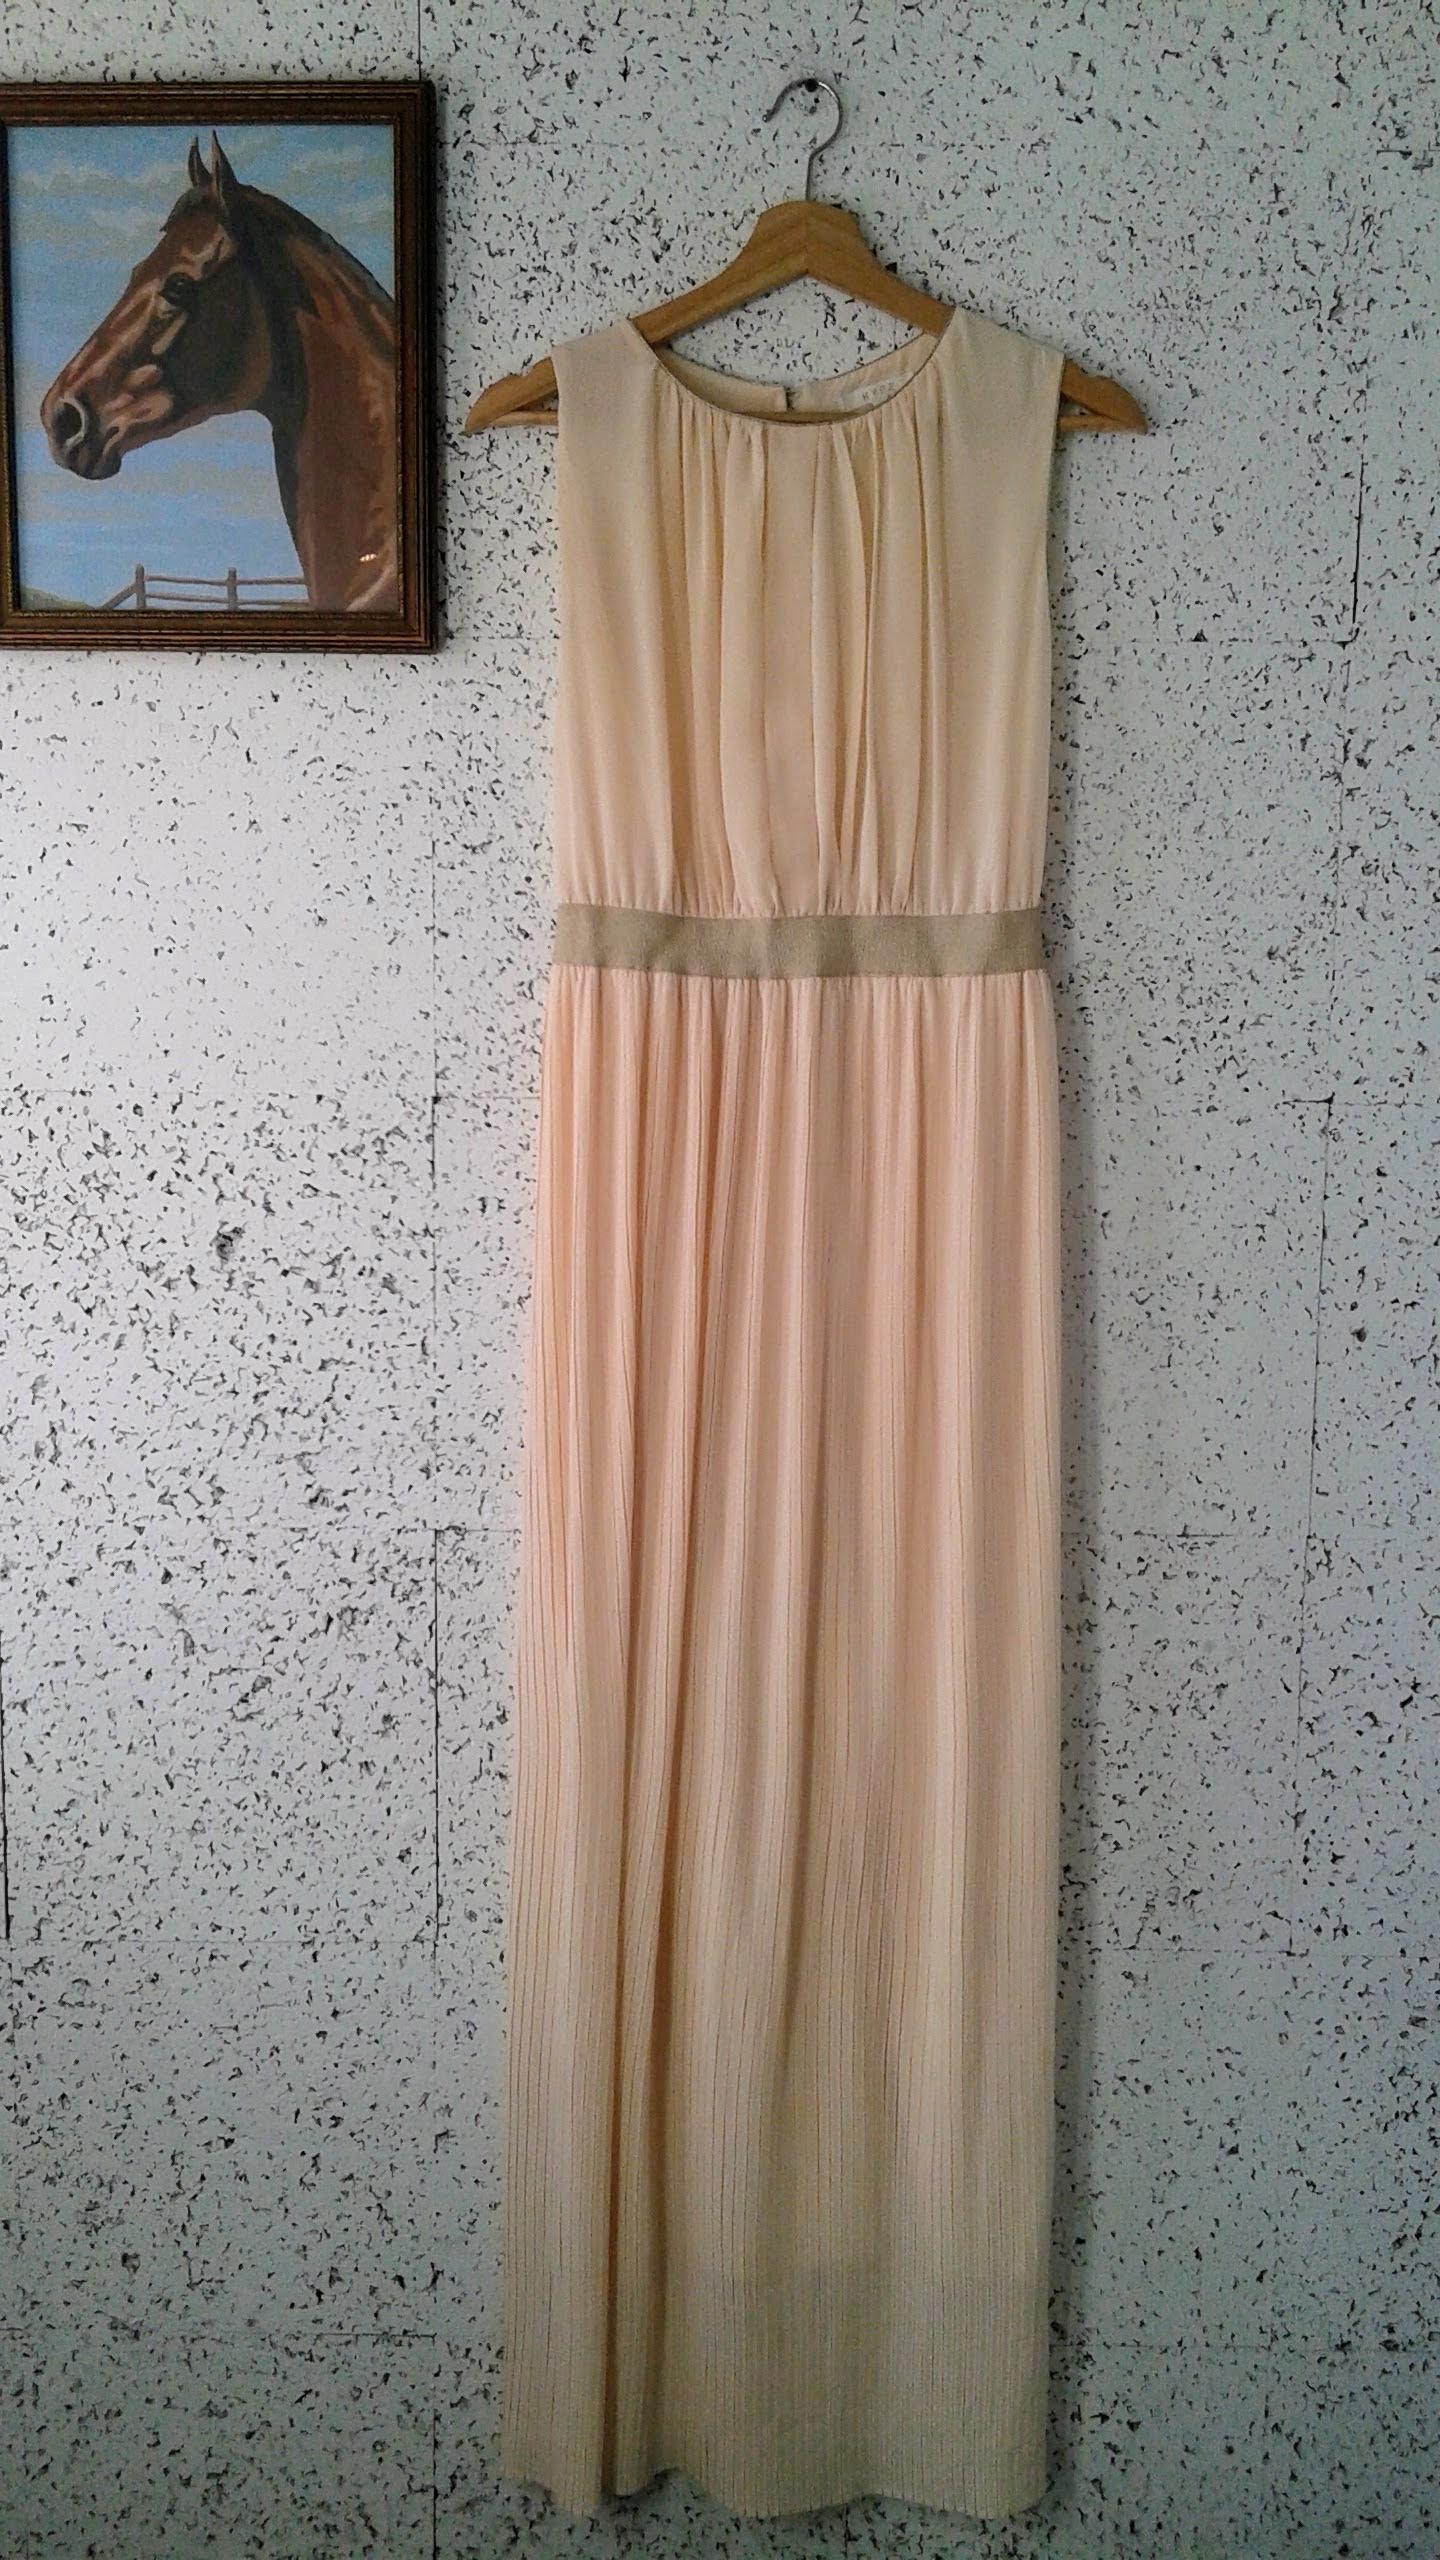 HYPR dress; Size M, $48